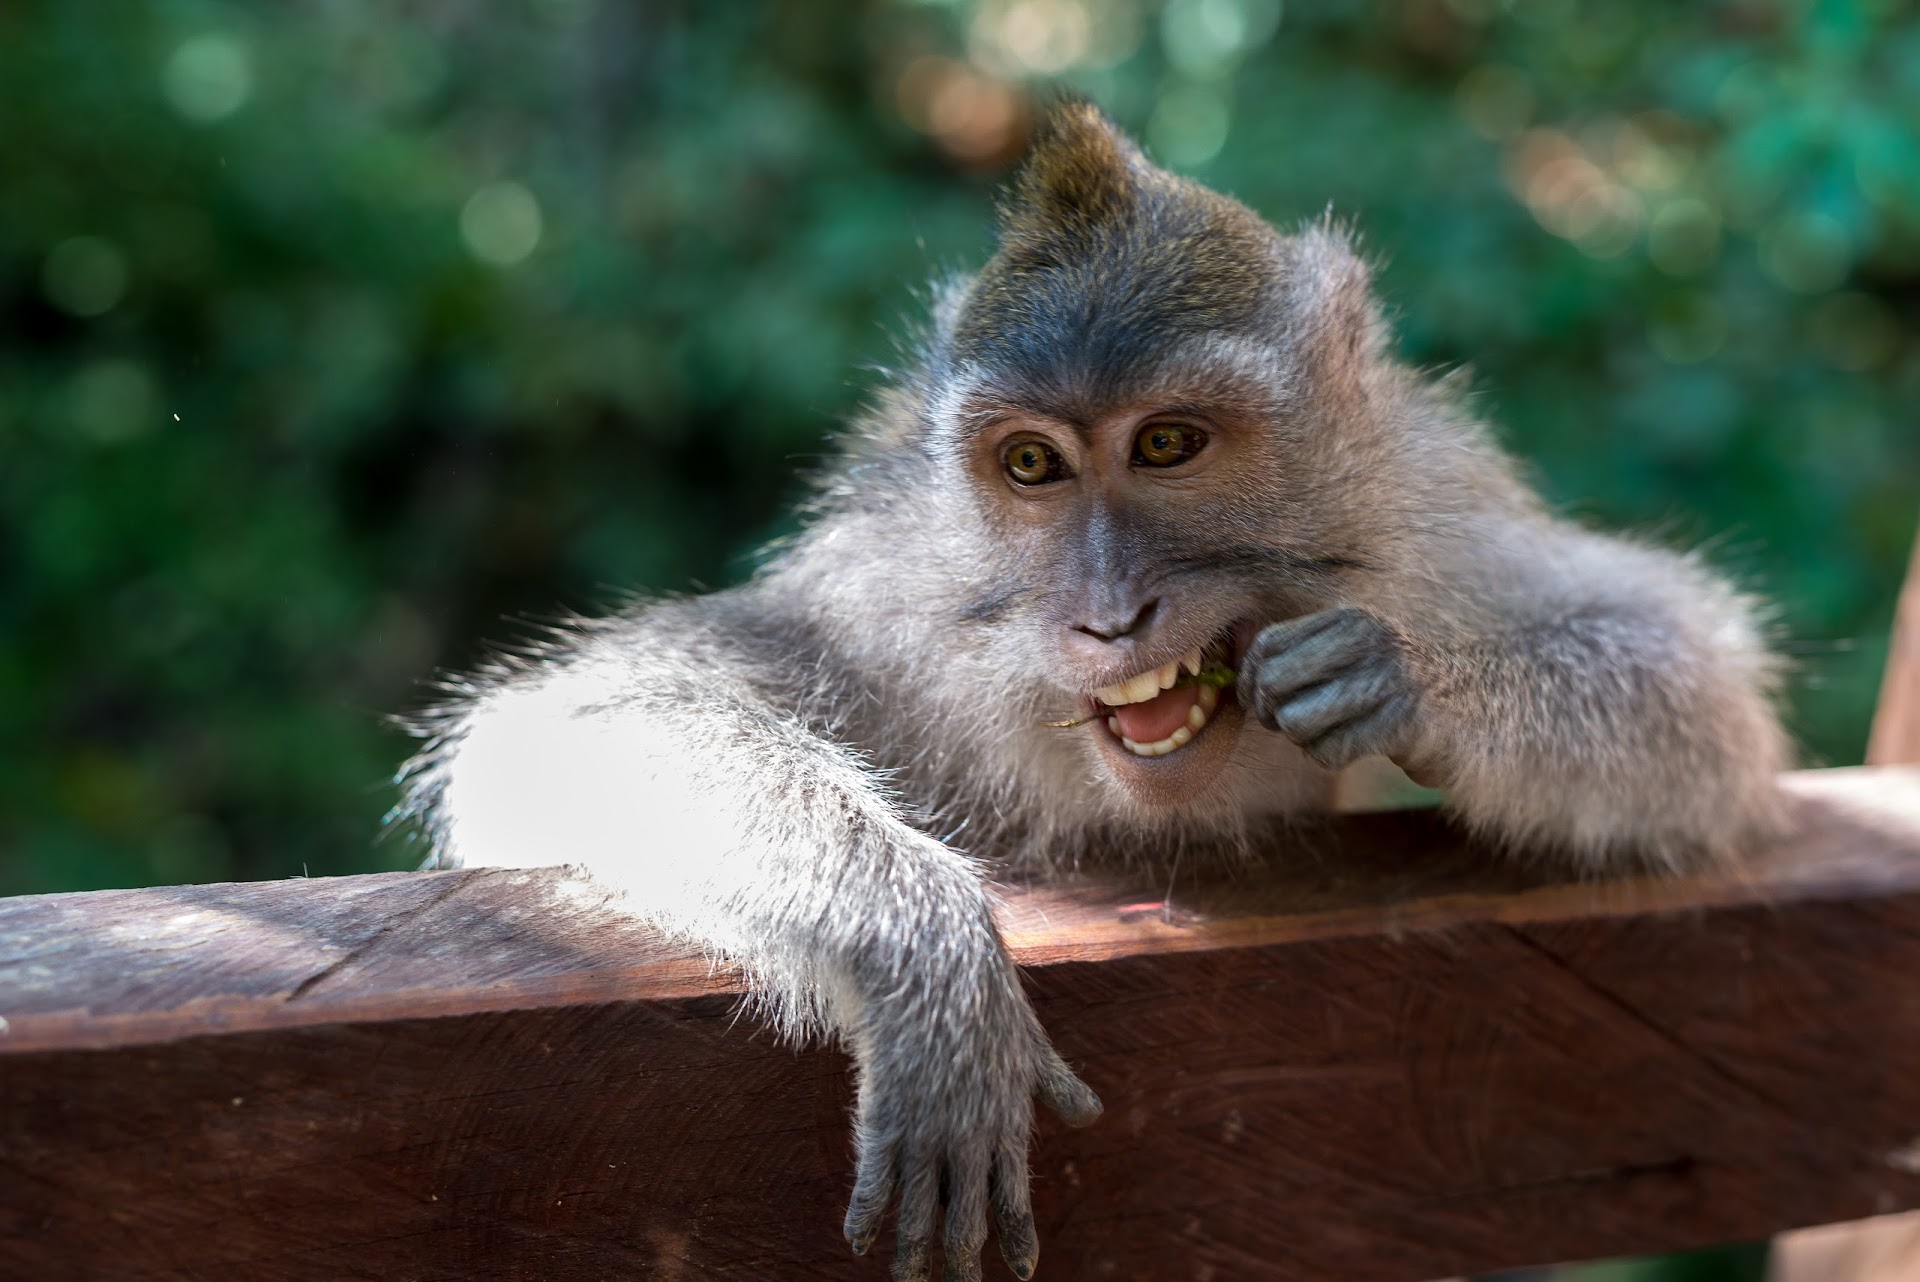 monkey photography, travel blogger, bali ubud, monkey sanctuary, photographer san francisco california, bay area, things to do in bali, bali blogger